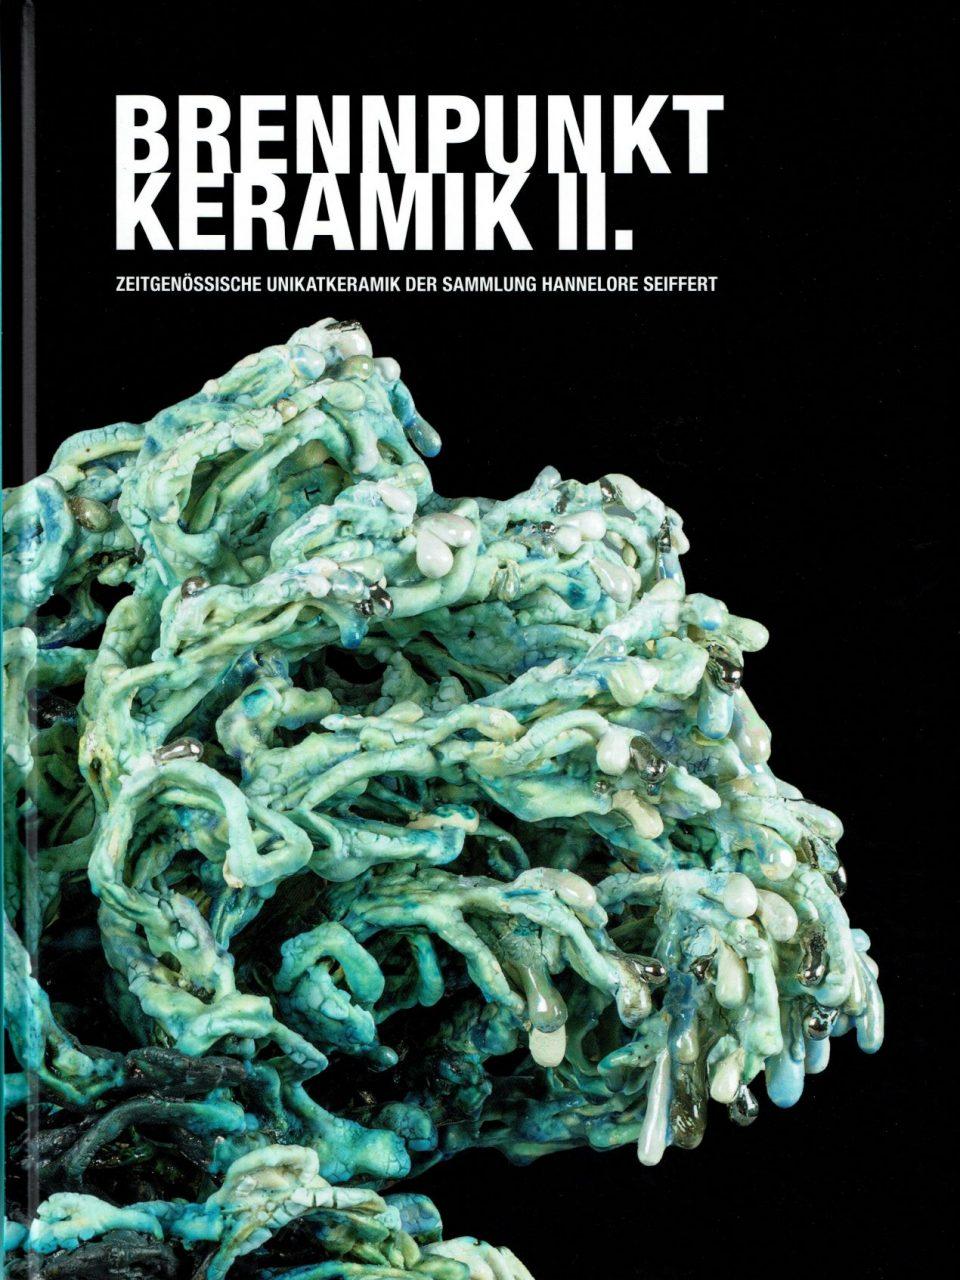 BRENNPUNKT KERAMIK II